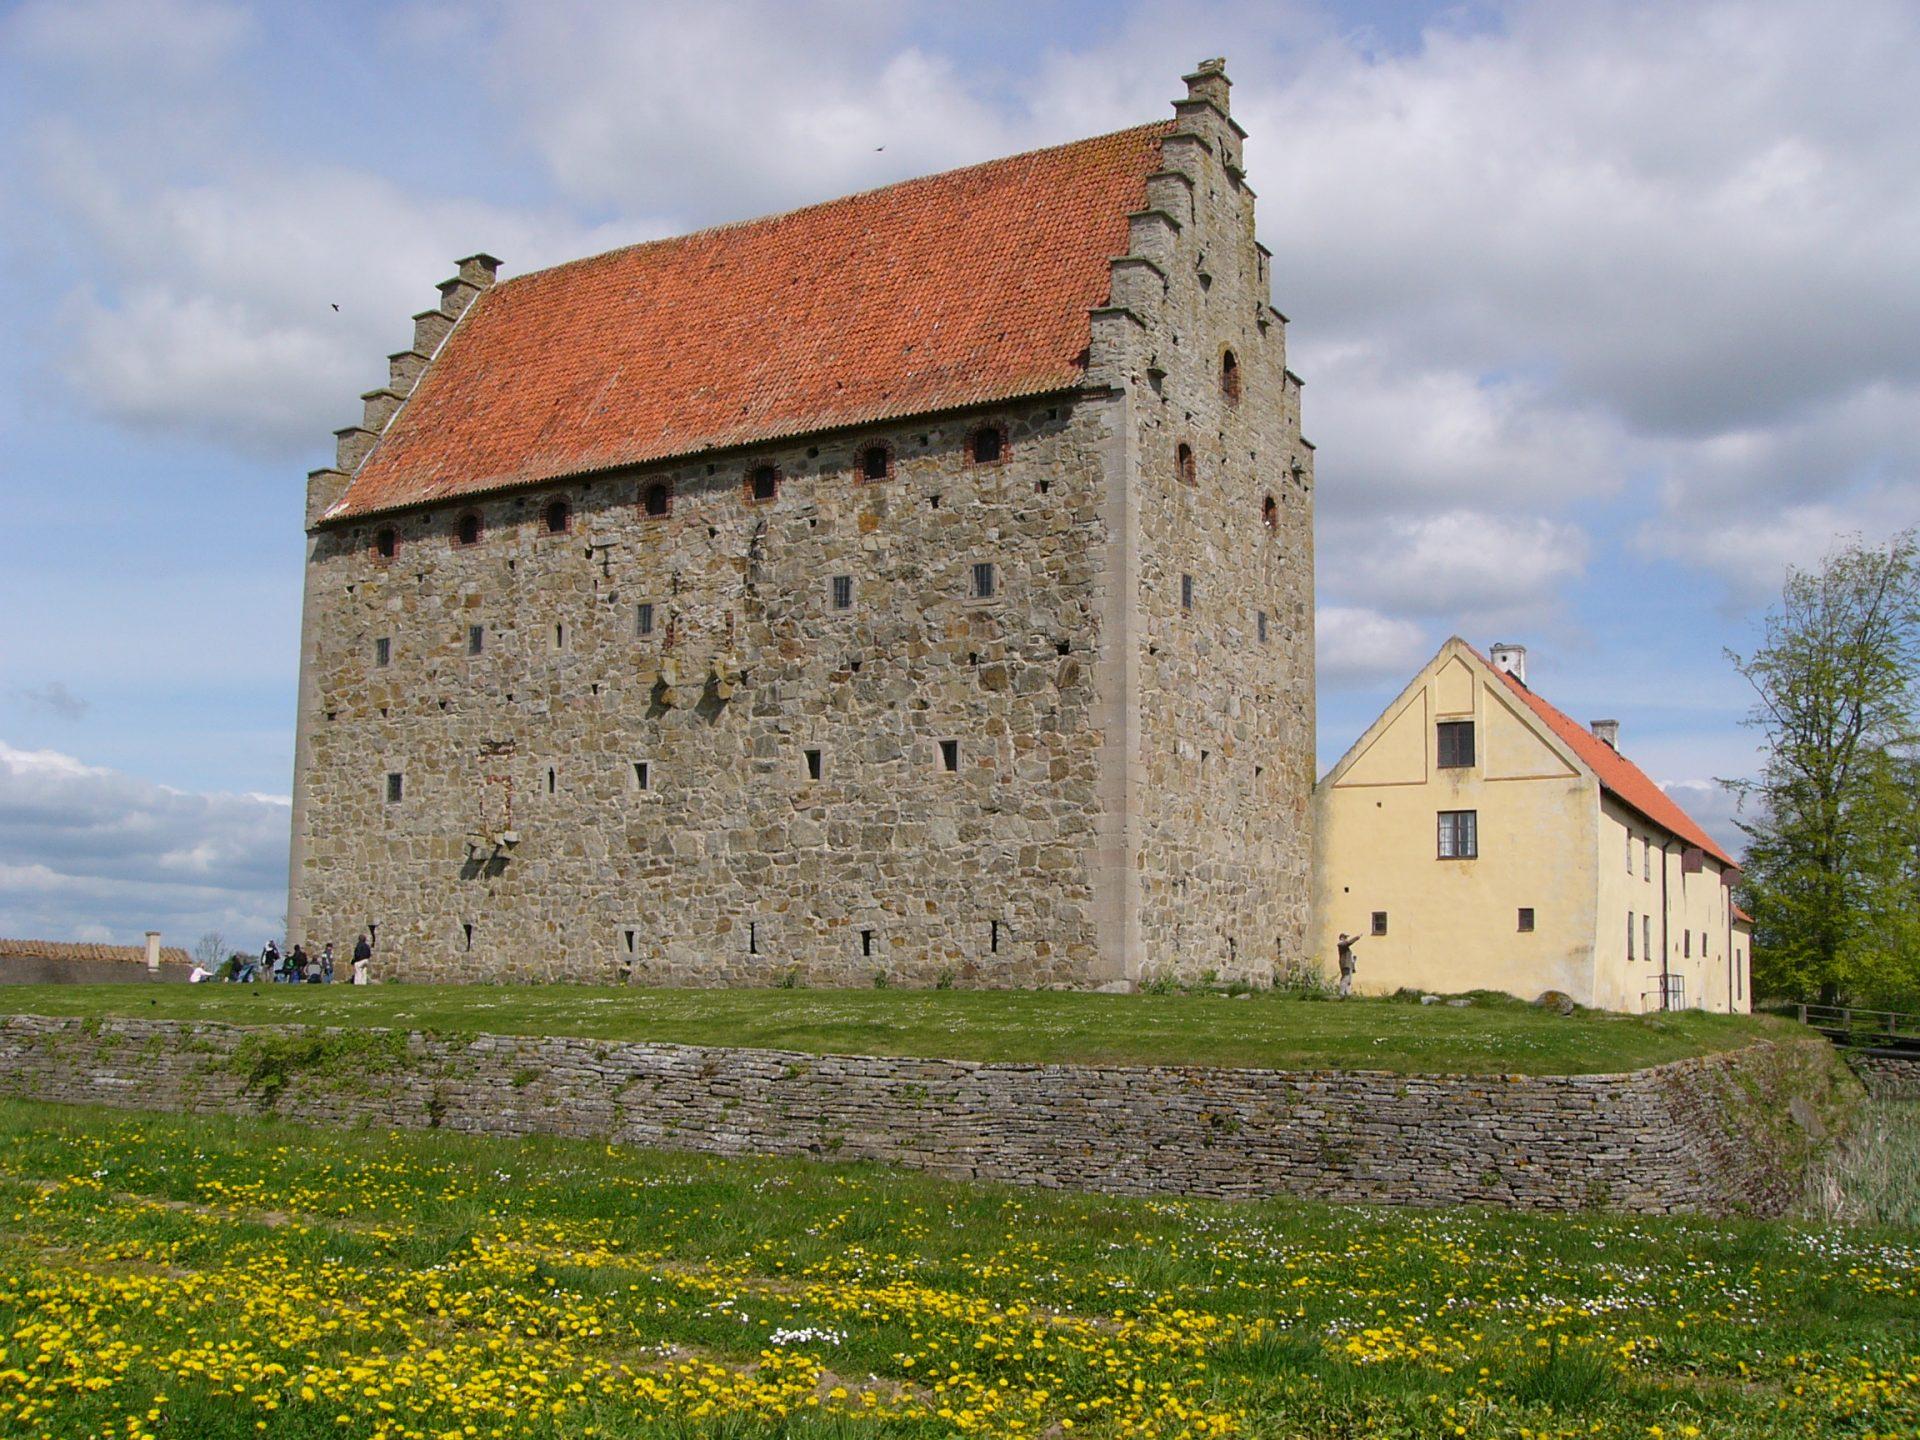 Foto av Glimmingehus i Skåne.